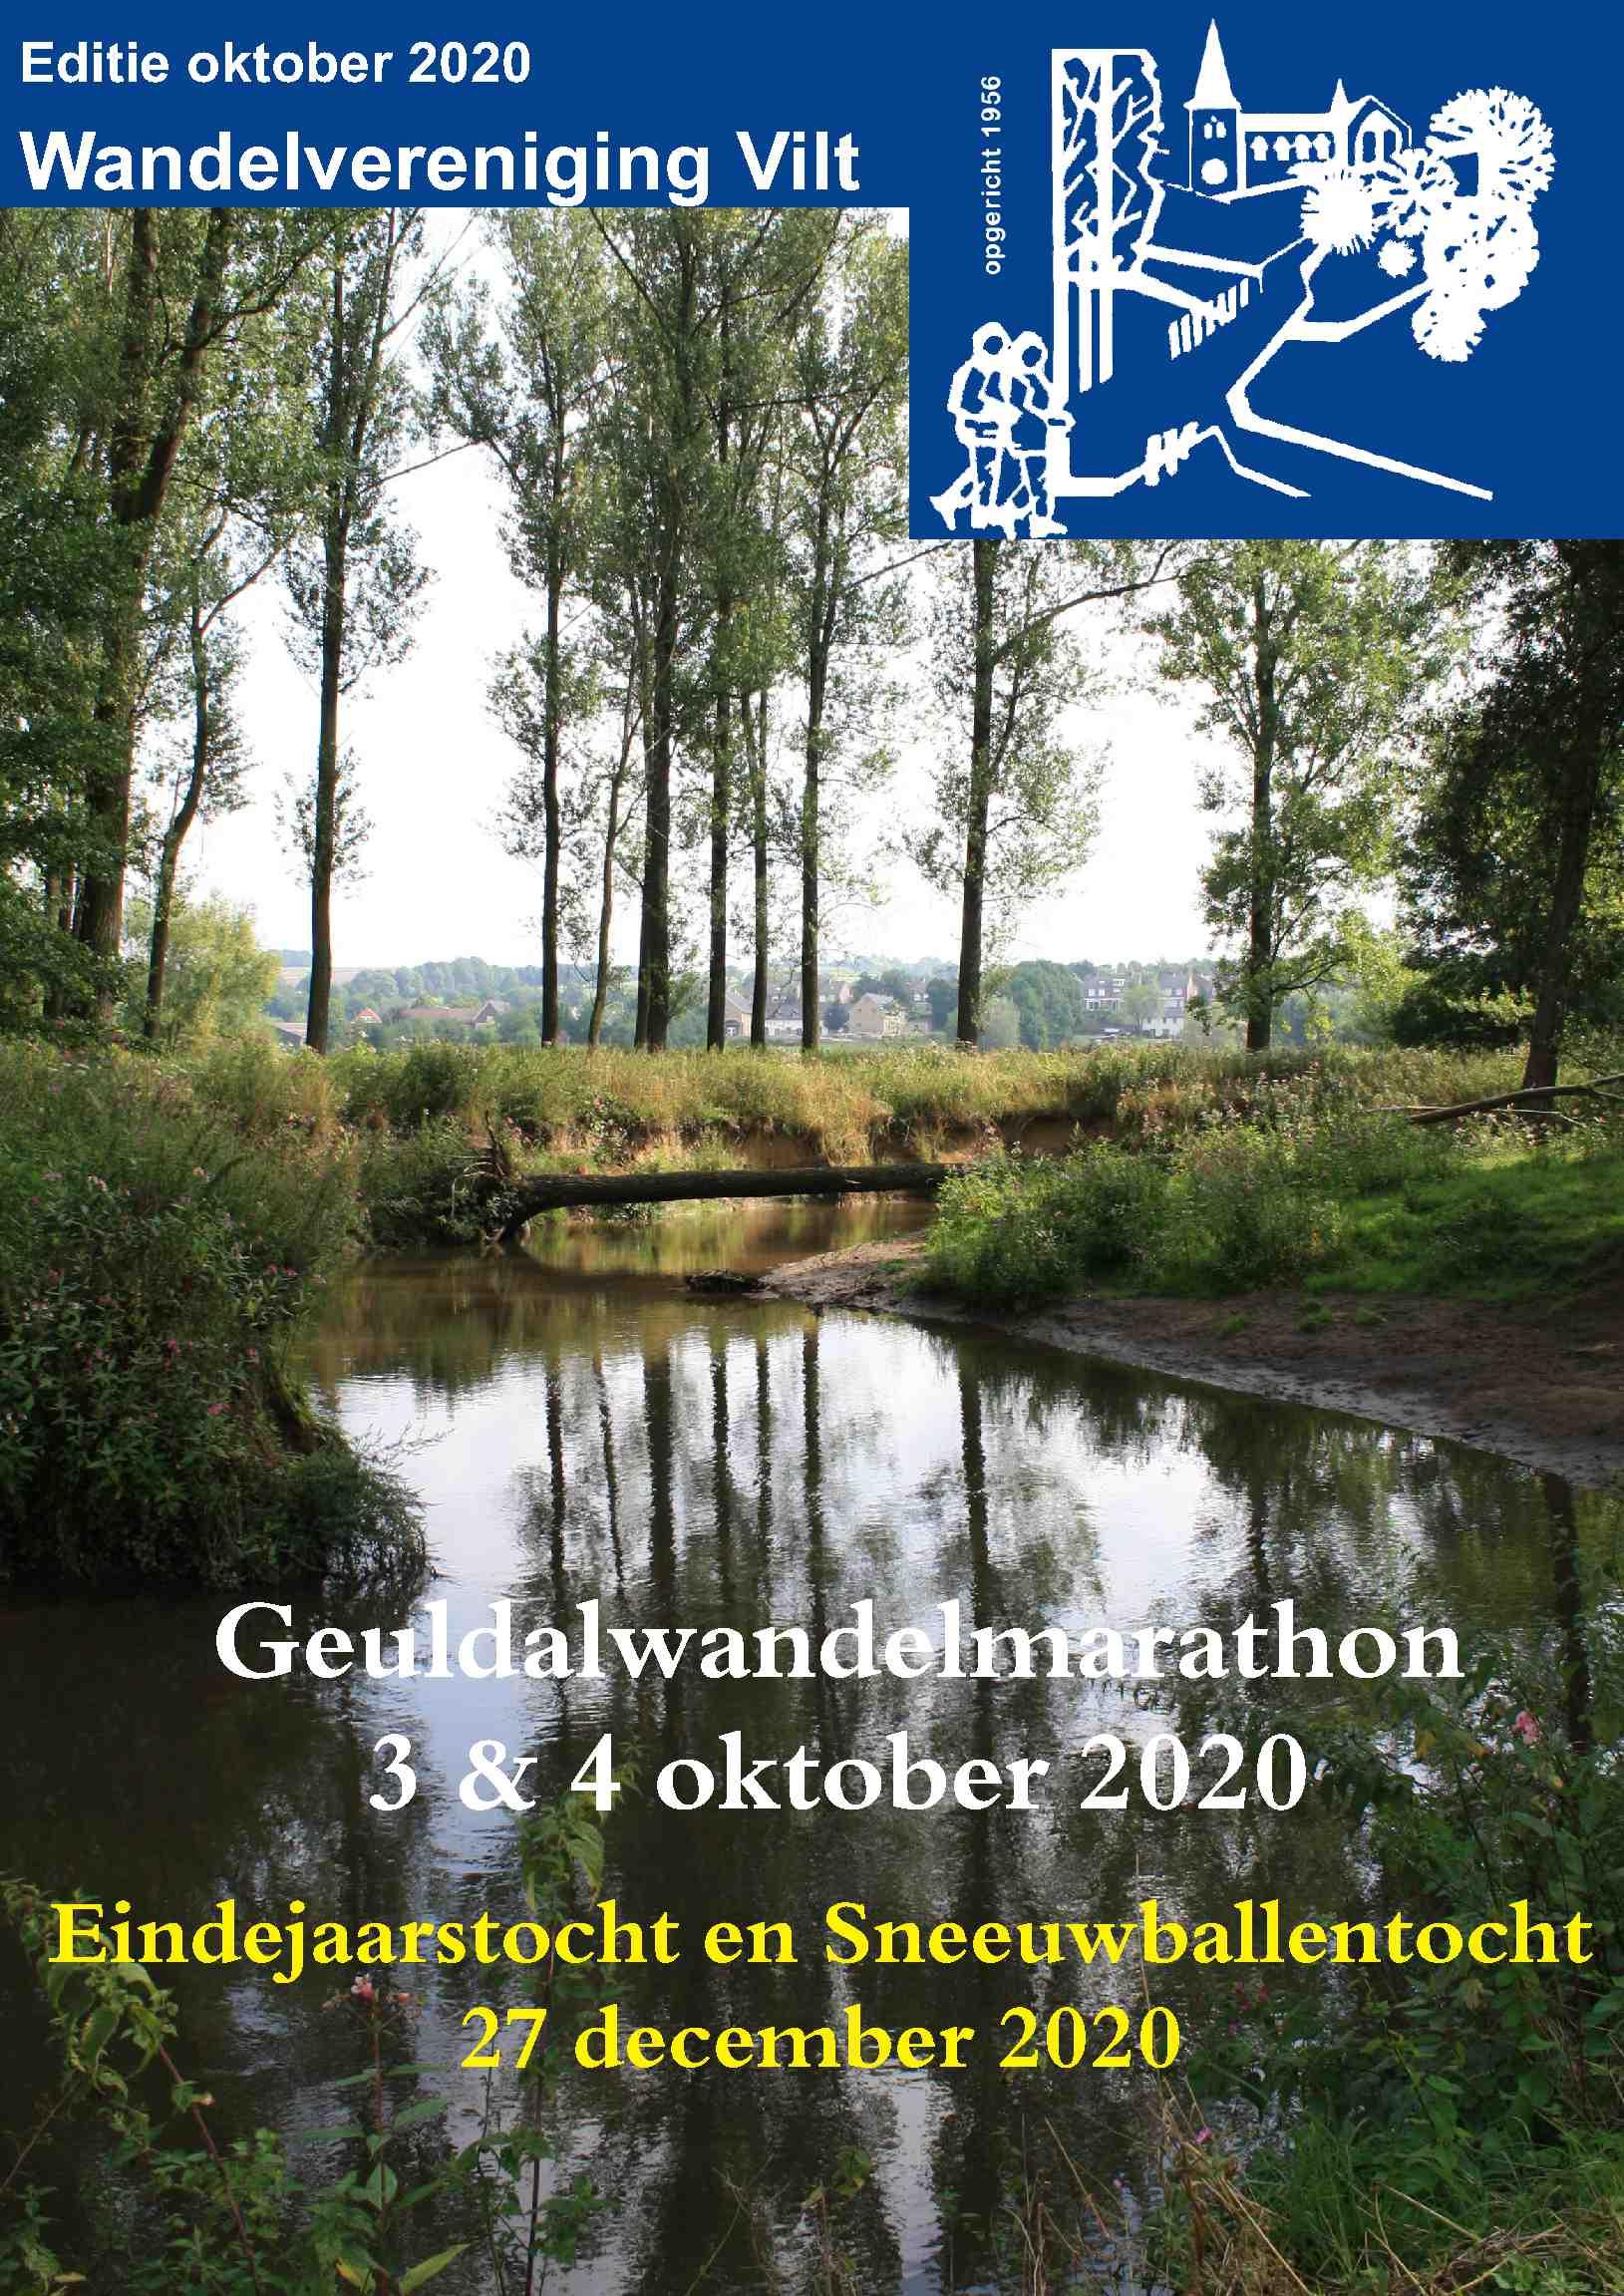 Cover editie september 2020